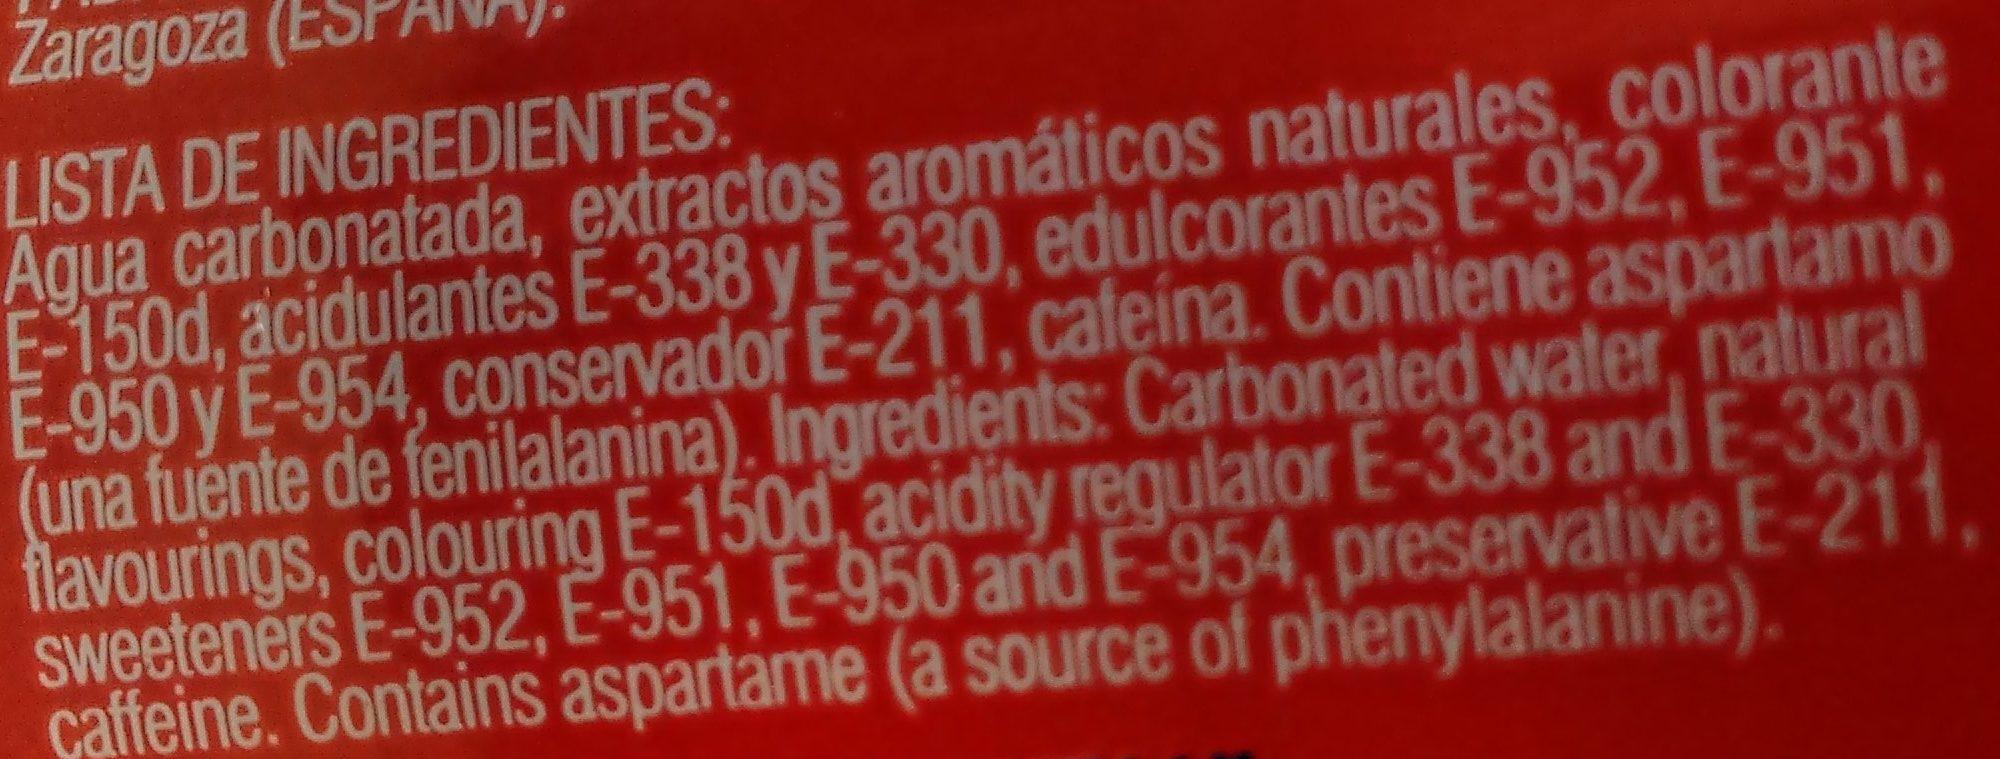 Berta Cola - Ingredientes - es